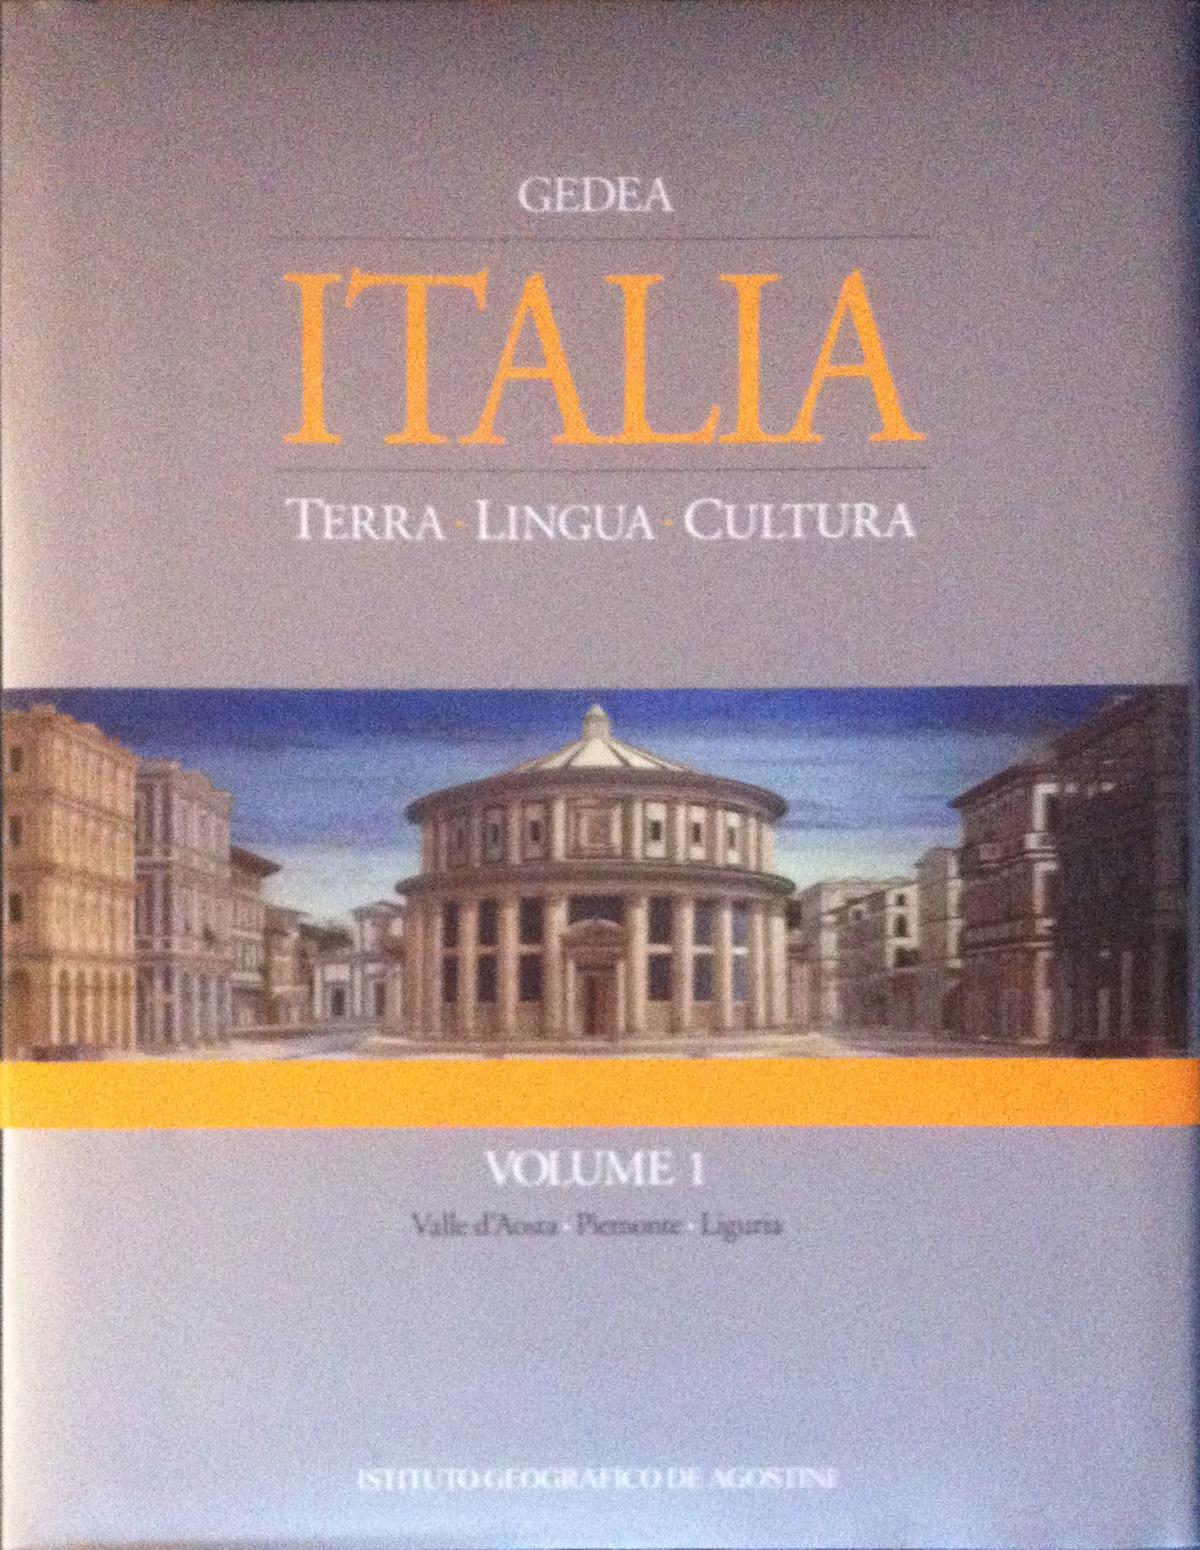 Gedea Italia – De Agostini